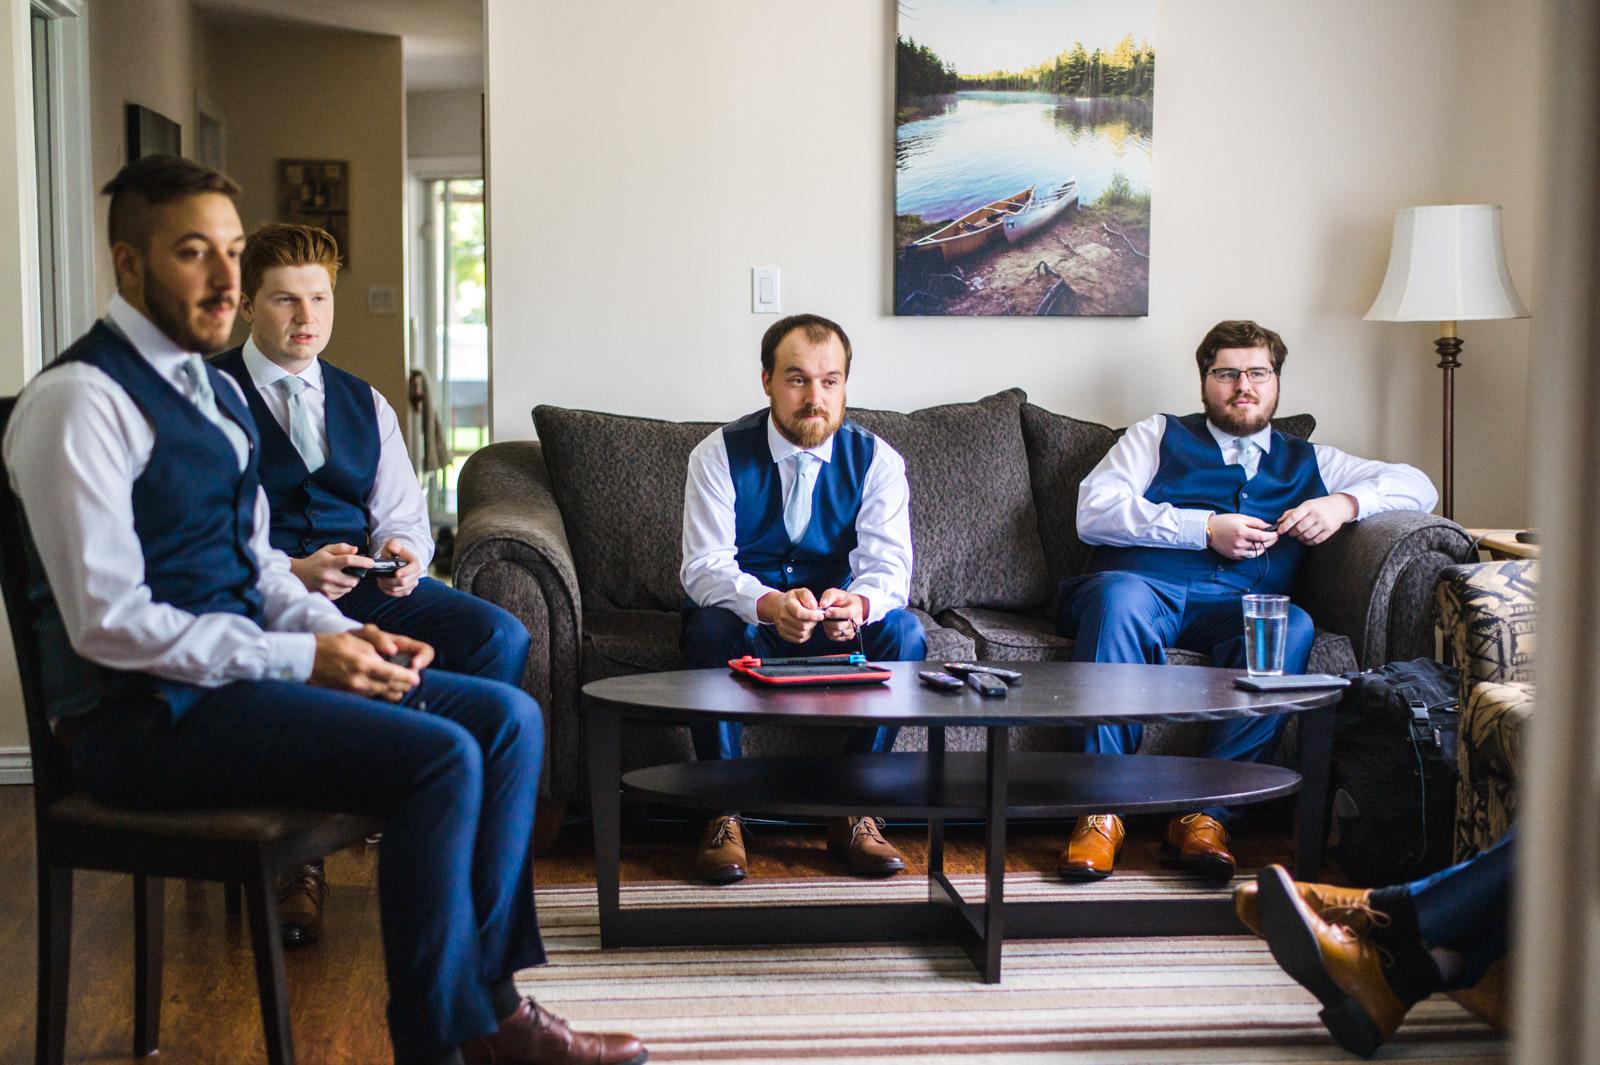 Emerson & Elicia's Golf Course Wedding Aidan & Leanne Hennebry Hamilton Wedding Videographers Photographers Niagara Hush Hush Photography & Film-6.jpg